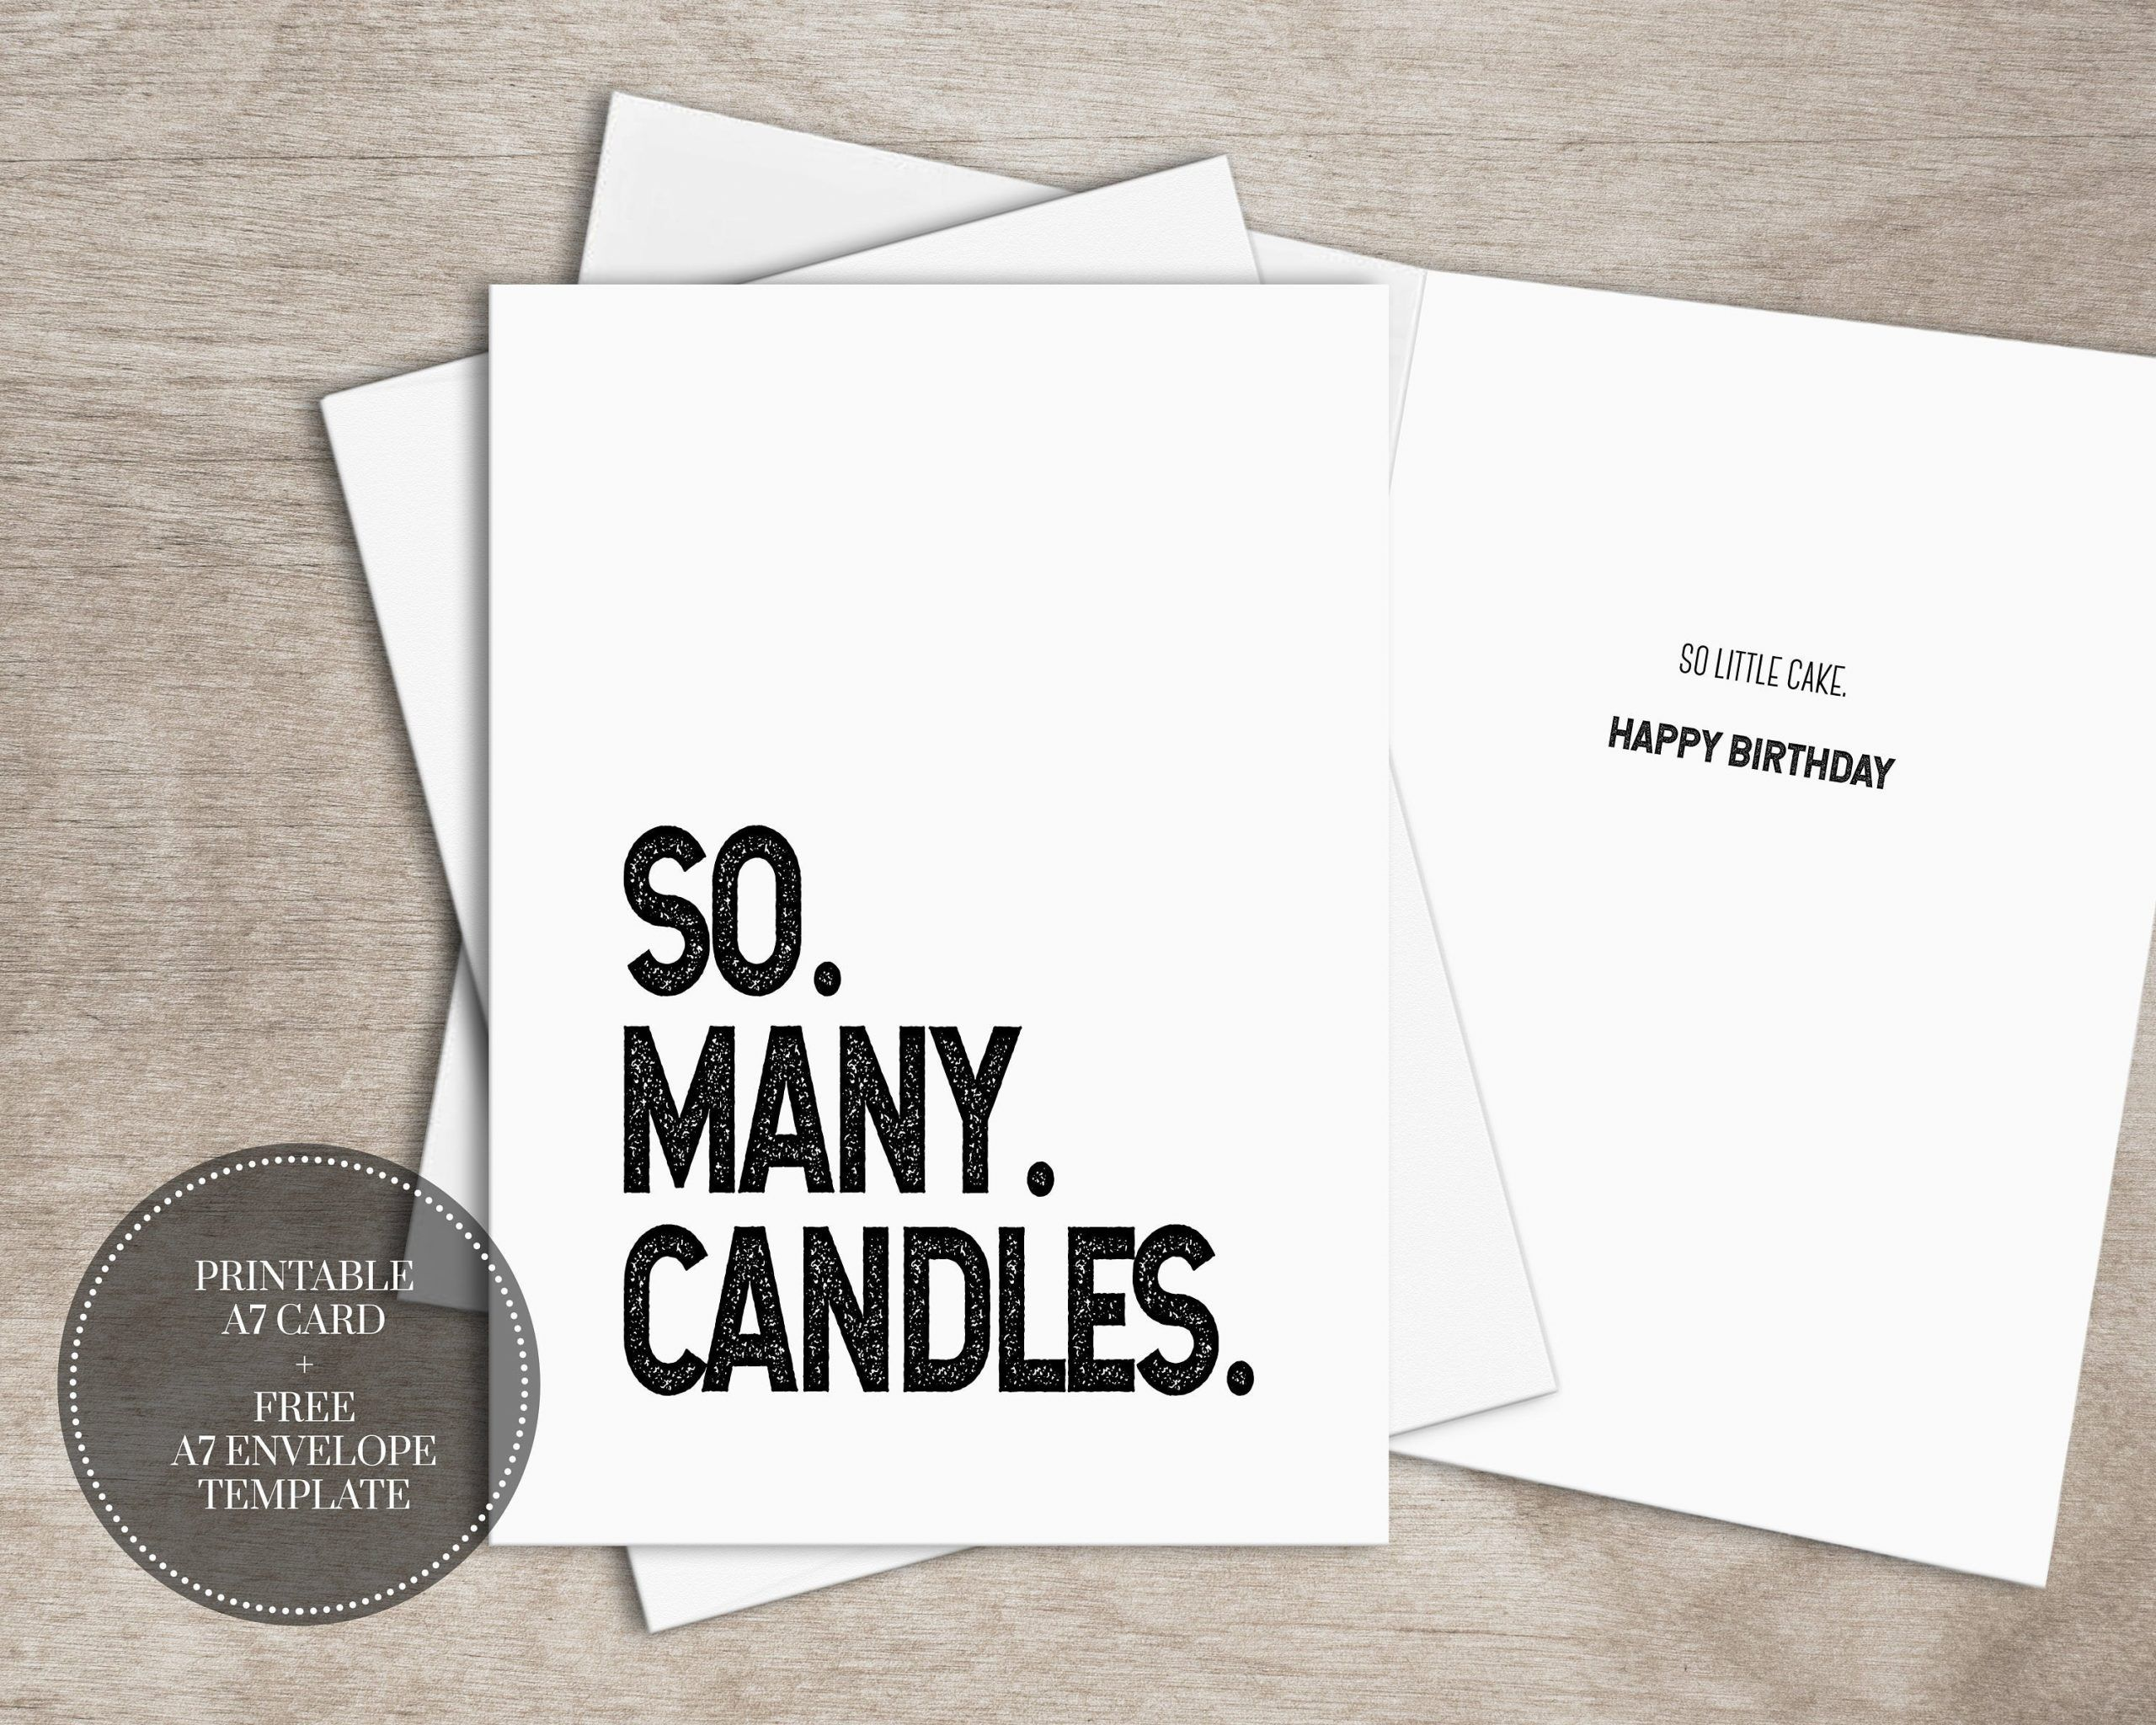 Printable Funny Birthday Card Fresh Printable Funny Birthday Card Instant Download Gift For Funny Birthday Cards Funny Printable Birthday Cards Birthday Cards